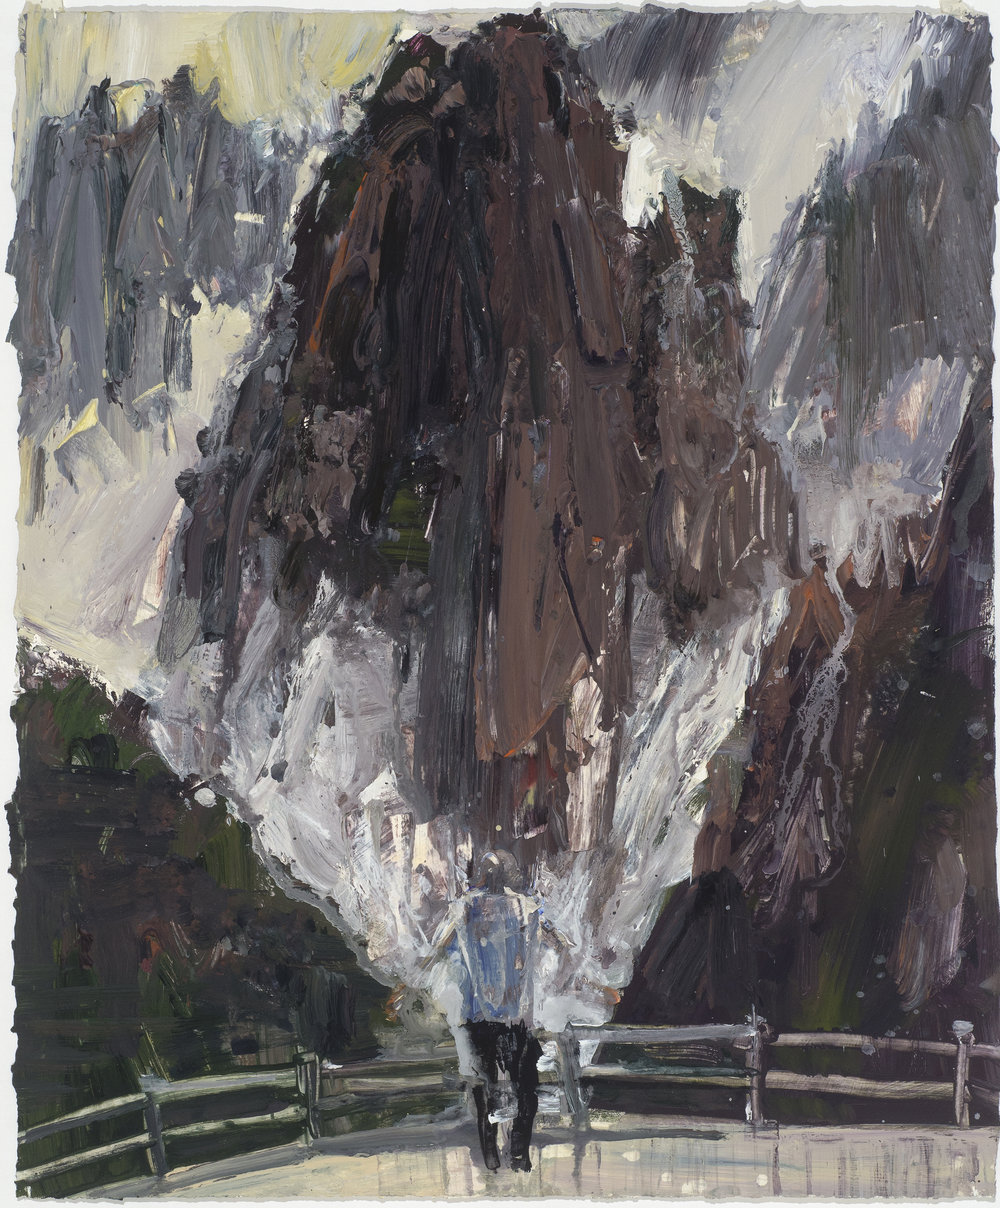 YM - Moses study  黃山– 摩西考察   Euan Macleod , 2016  Acrylic on paper, 81 x 67 cm, HKD 29,300 framed